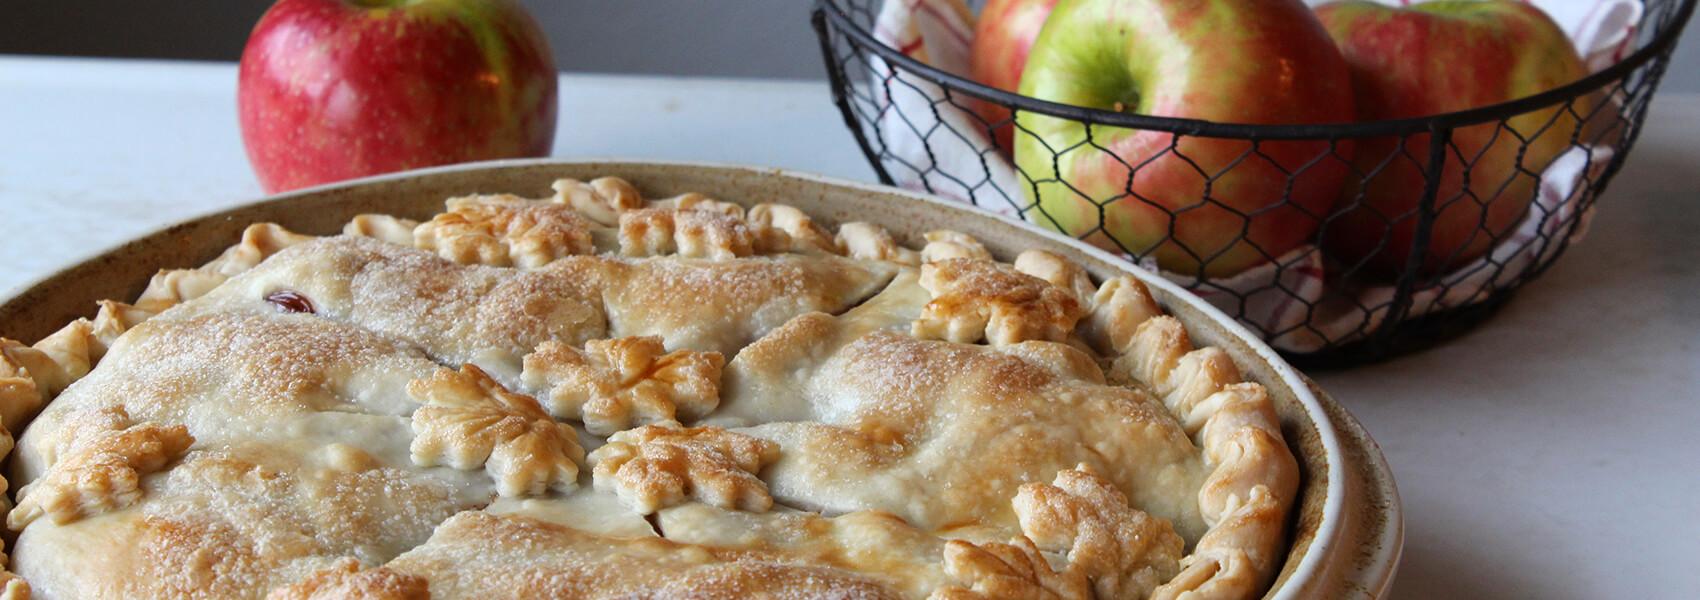 Easy Apple Pie (Photo: Chelsi Fisher)